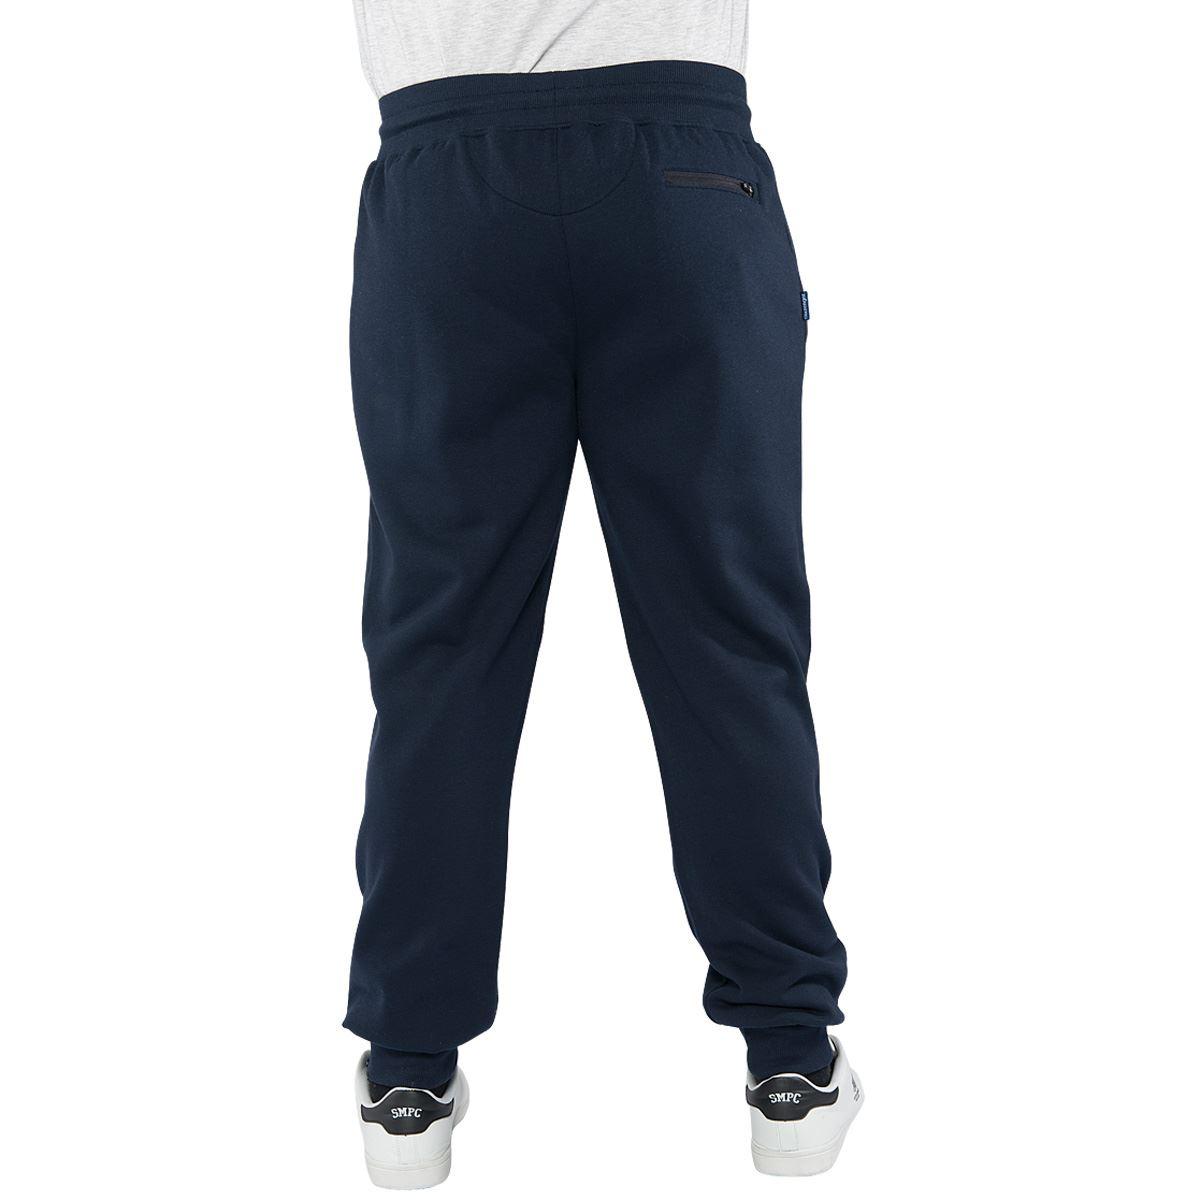 Slazenger-Hombre-Talla-Grande-Joggers-Con-Punos-Informal-Pantalones-De-Chandal